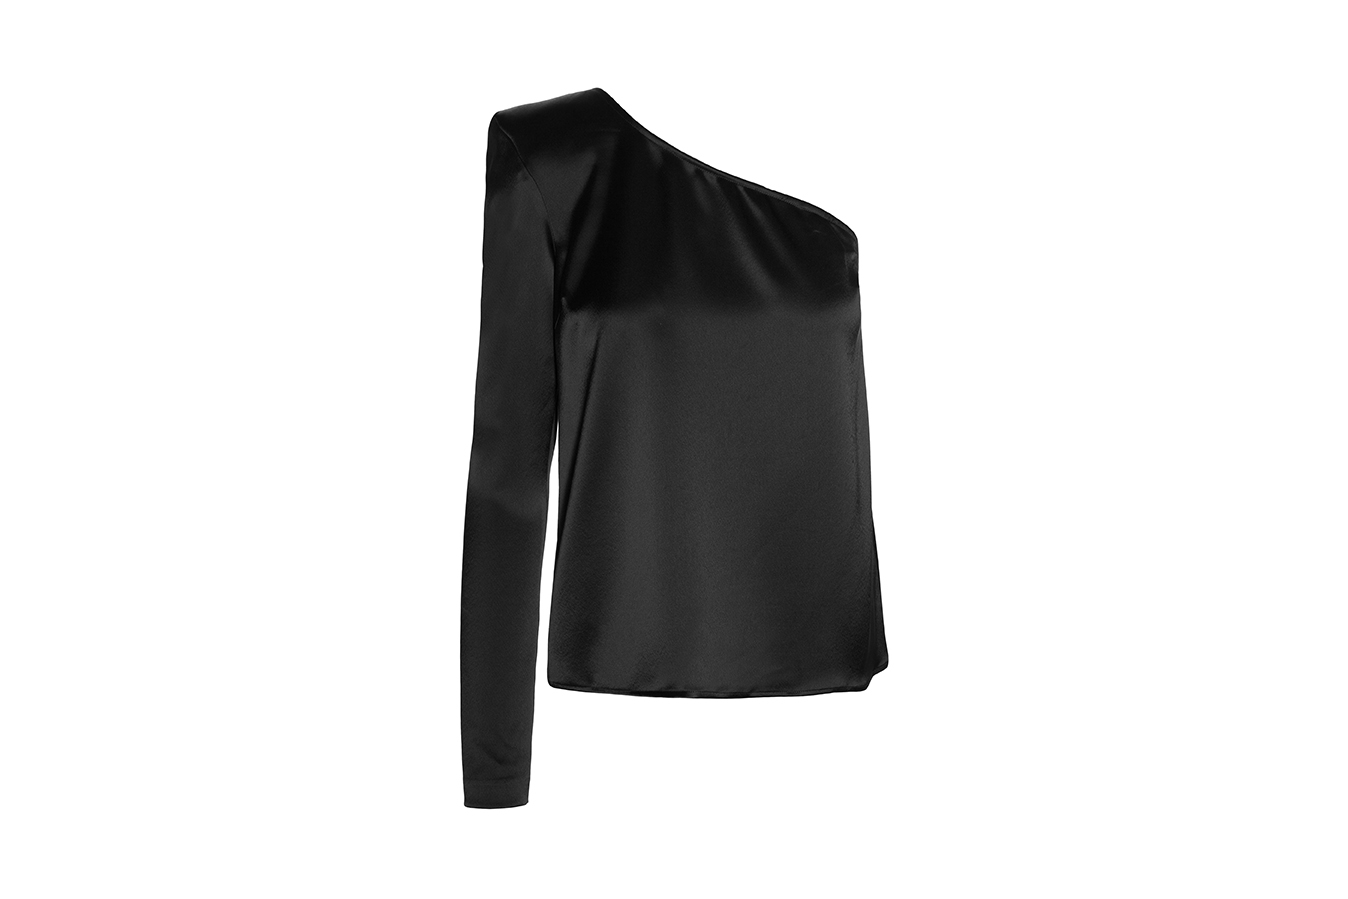 Camisa asimétrica negra Anonymous Closet